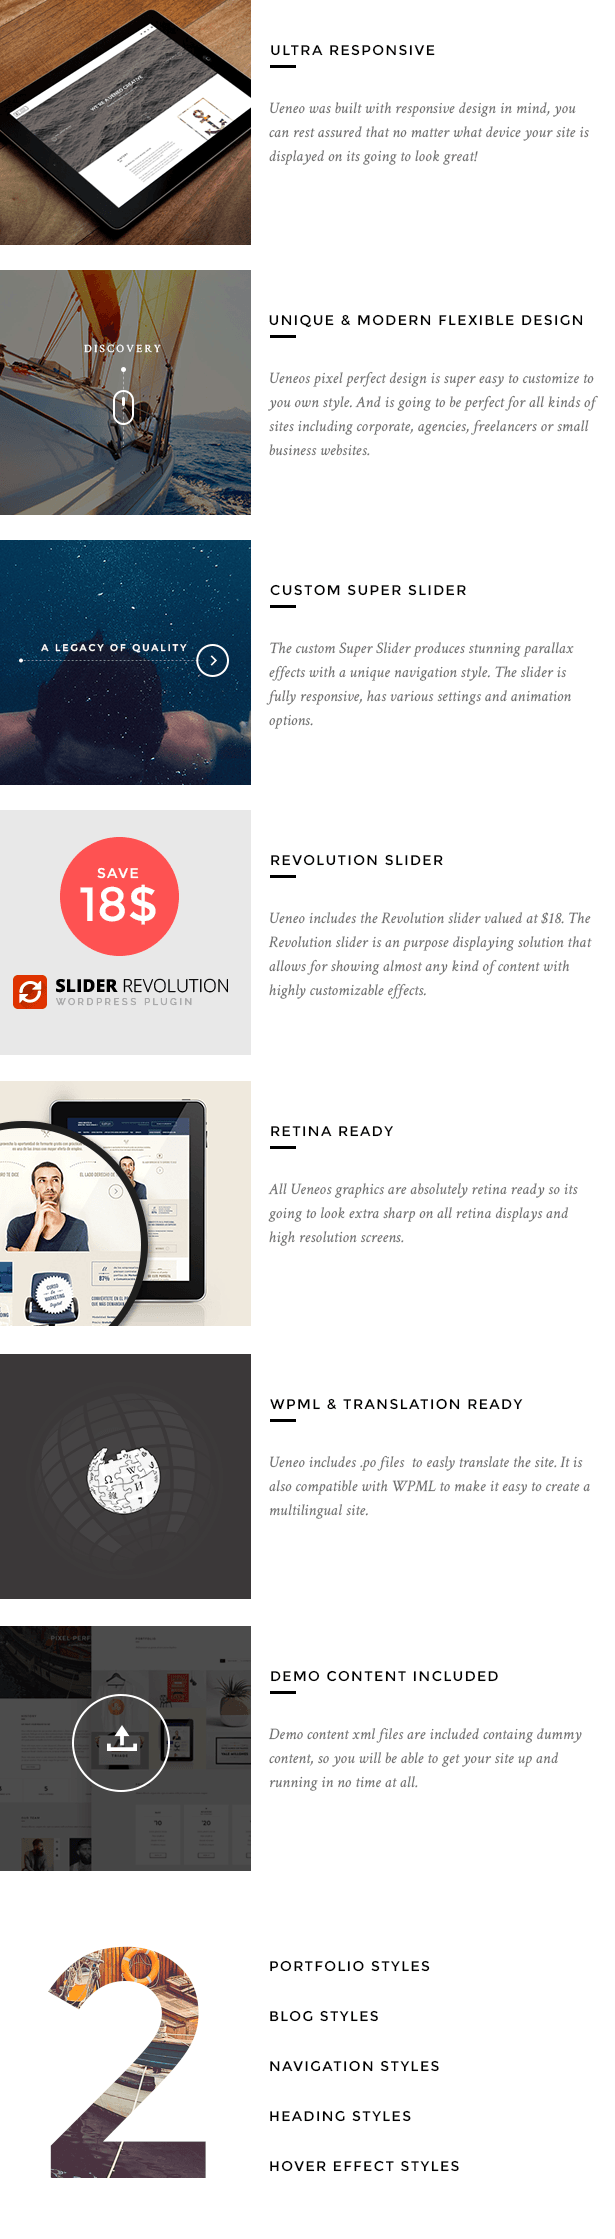 Ueneo - Creative One Page Parallax WordPress Theme - 1